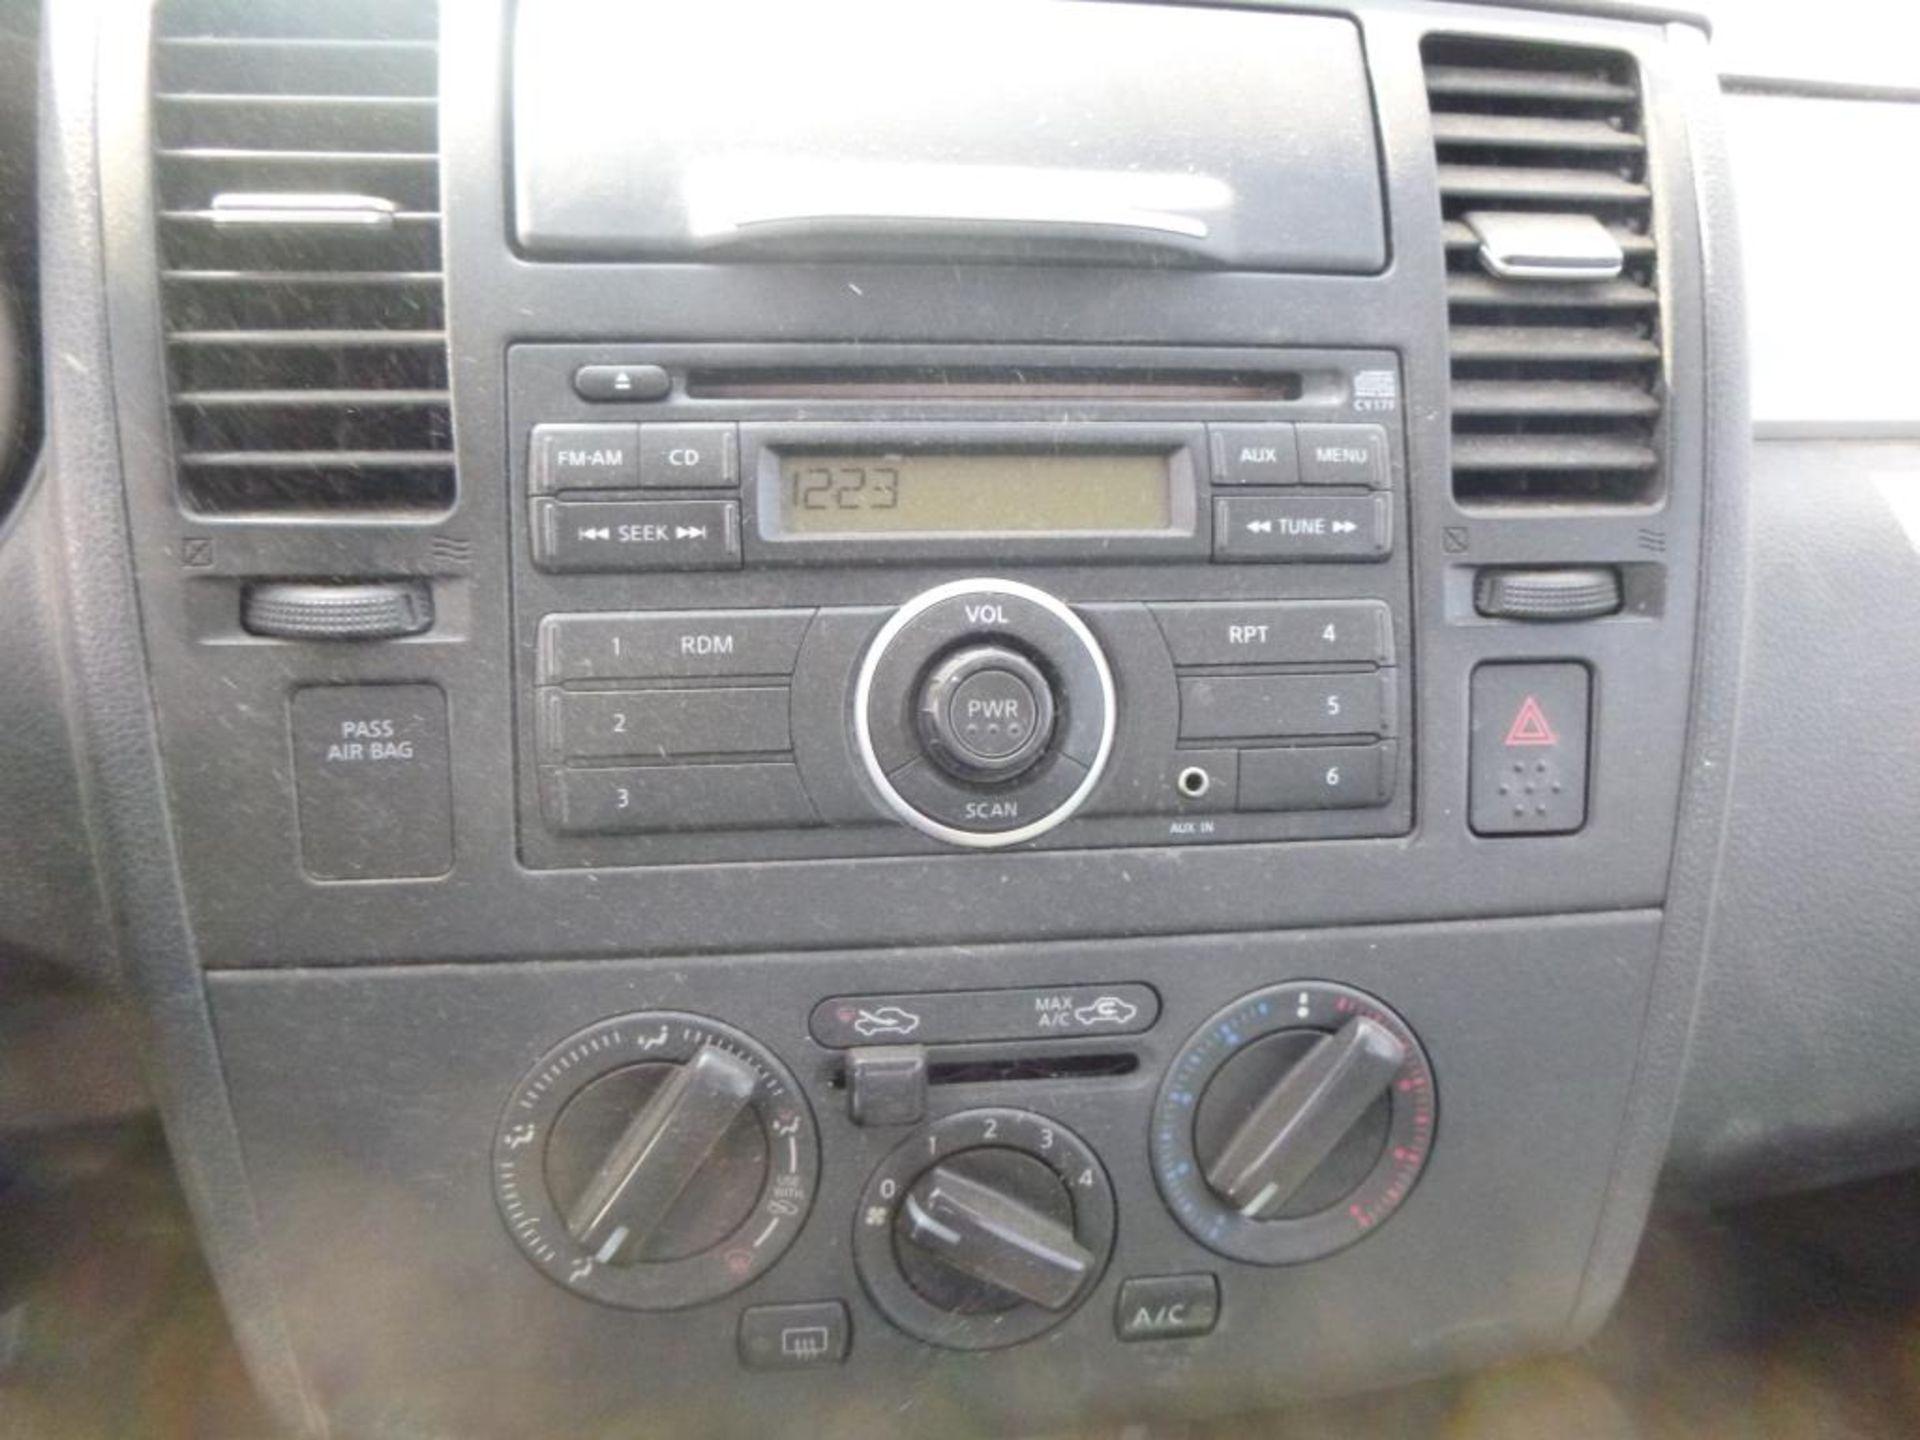 2010 Nissan Versa - Image 13 of 13